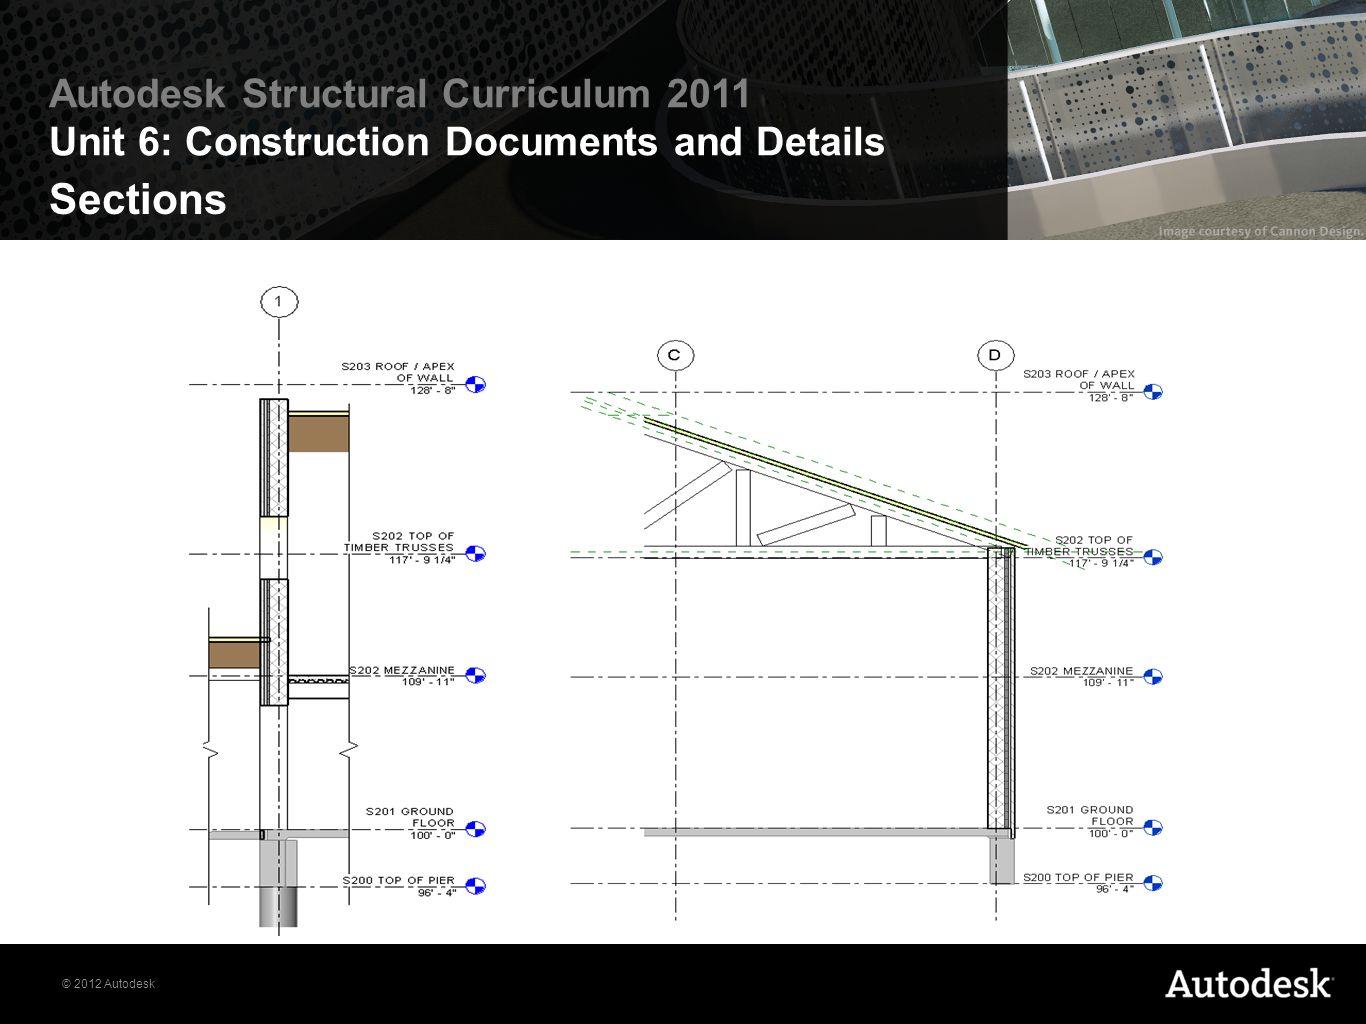 © 2012 Autodesk Autodesk Structural Curriculum 2011 Unit 6: Construction Documents and Details Sections